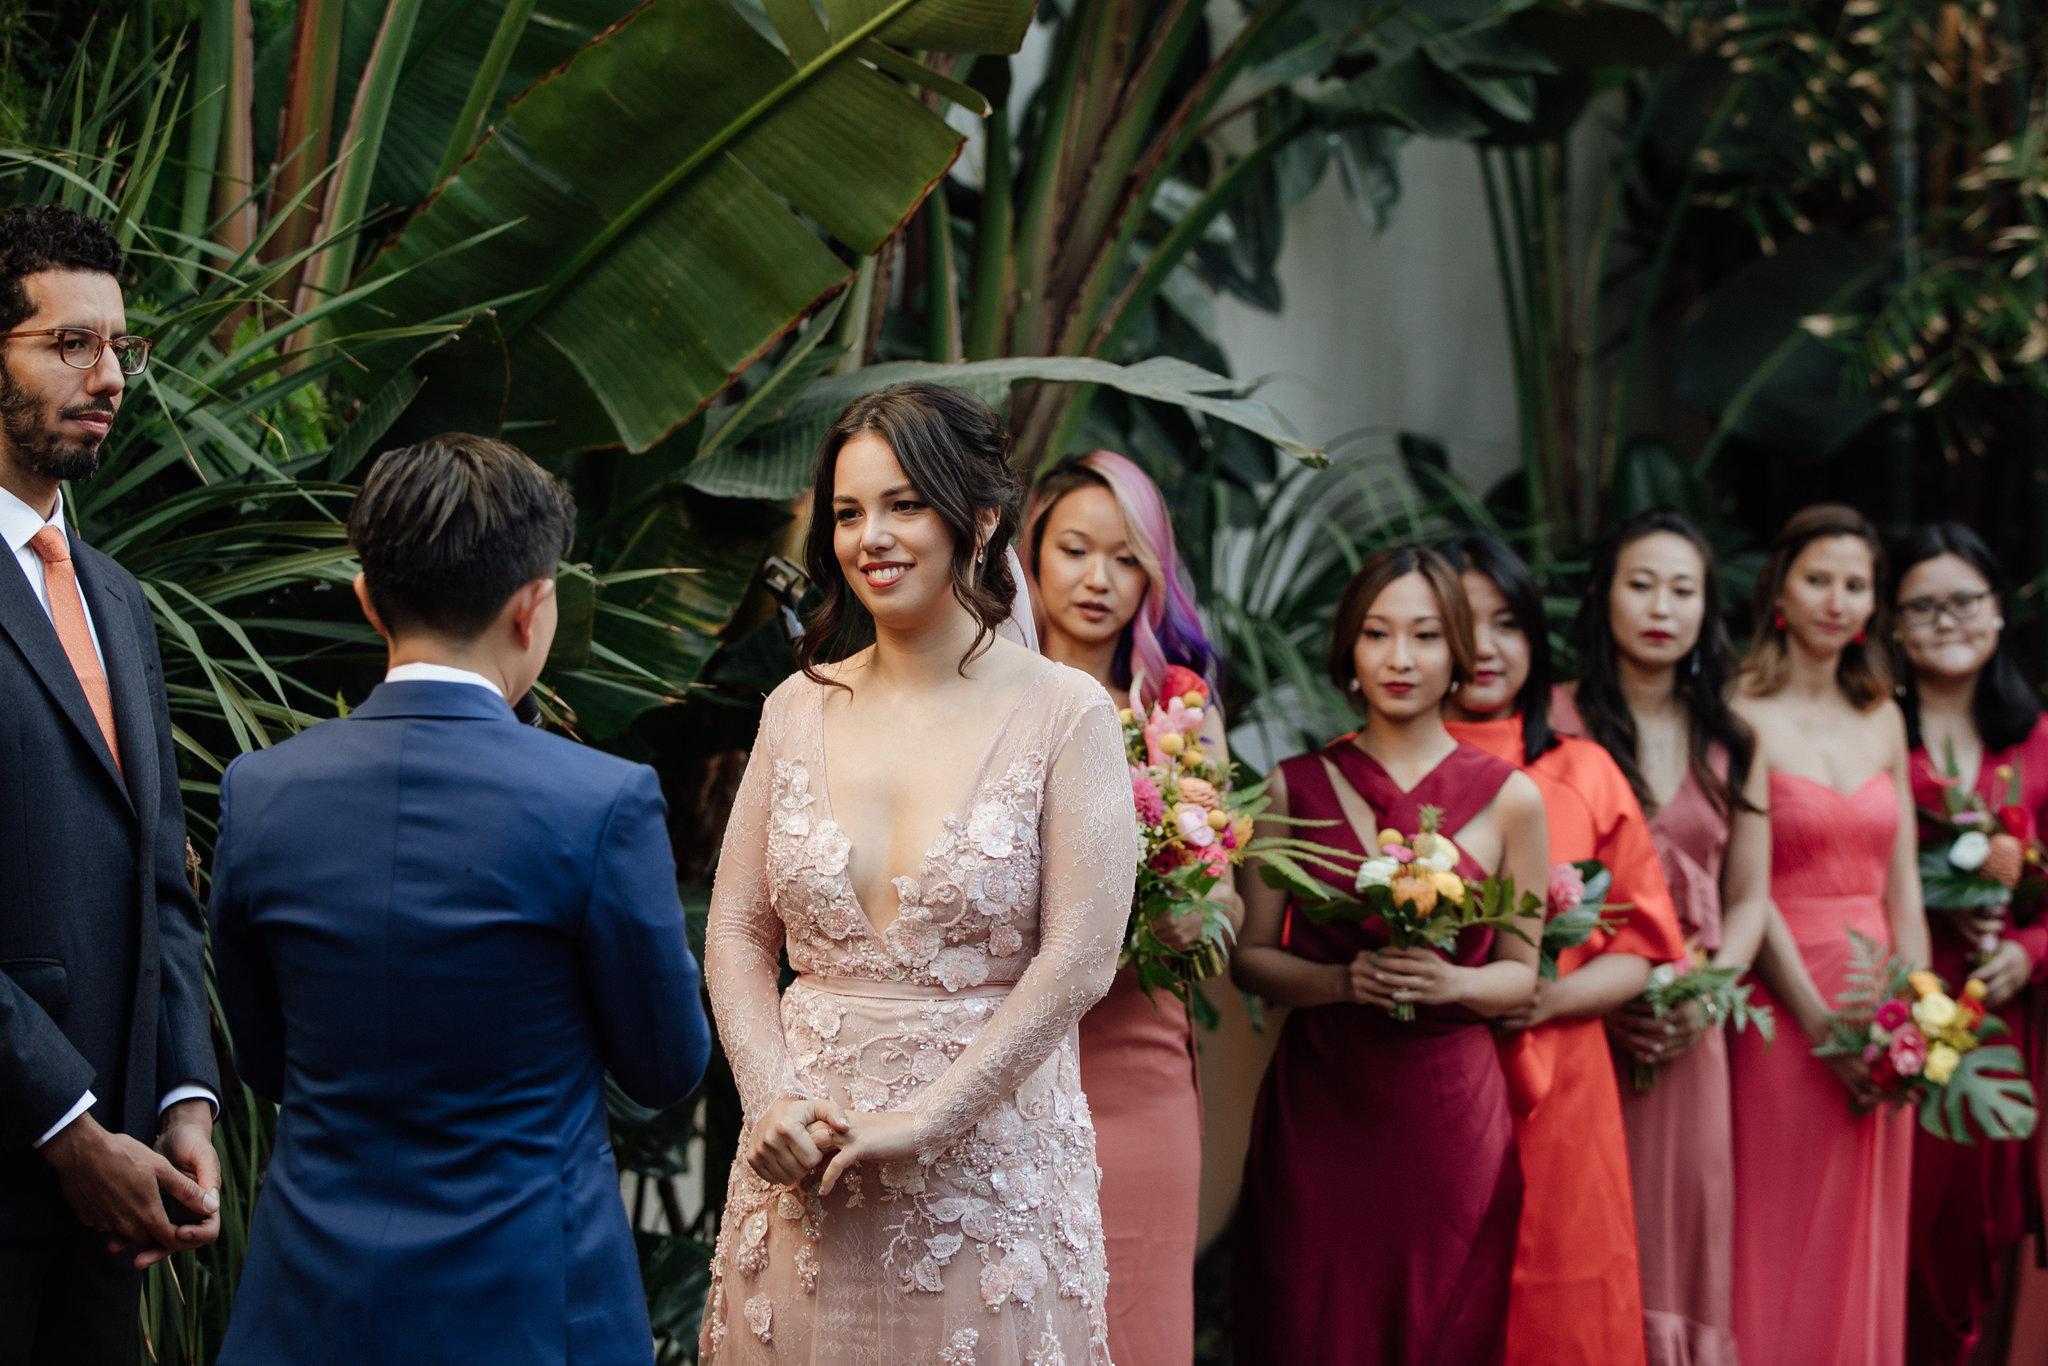 millwick-wedding-marble-rye-photography-030118-ceremony-072.jpg